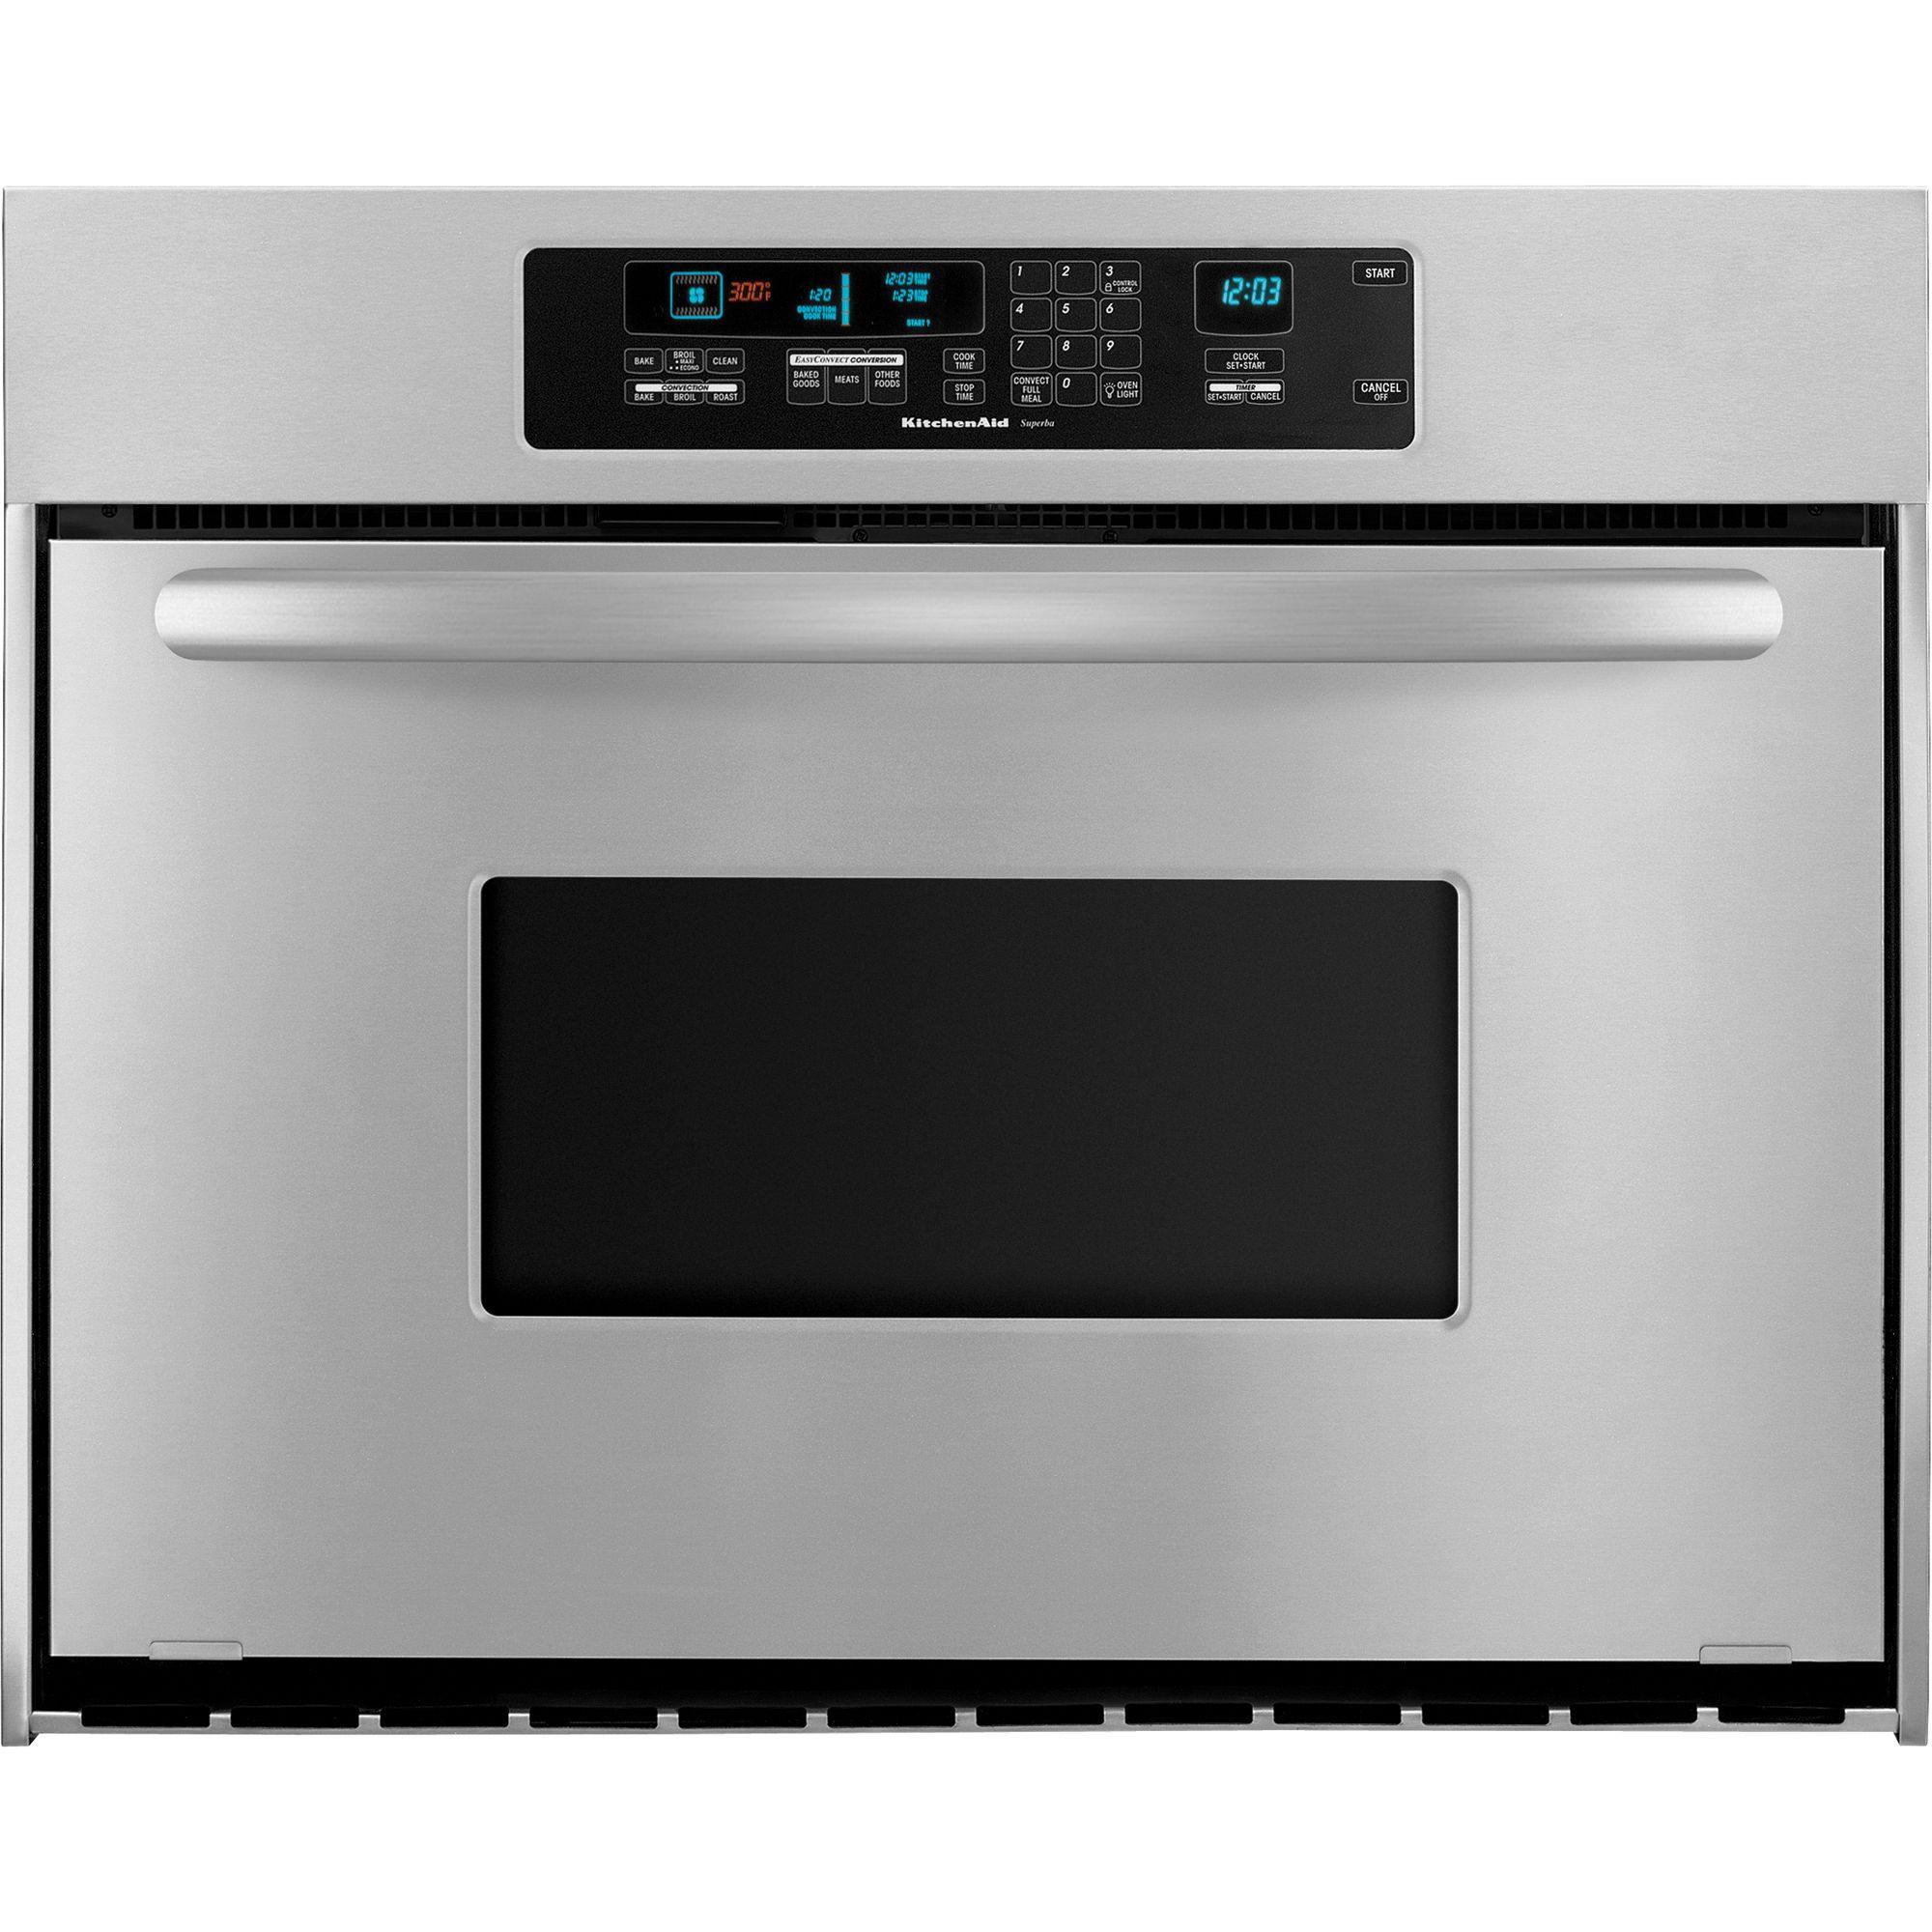 "Kitchen Aid Wall Oven  KitchenAid KEBC167VSS Architect 36"" Single Wall Oven w"